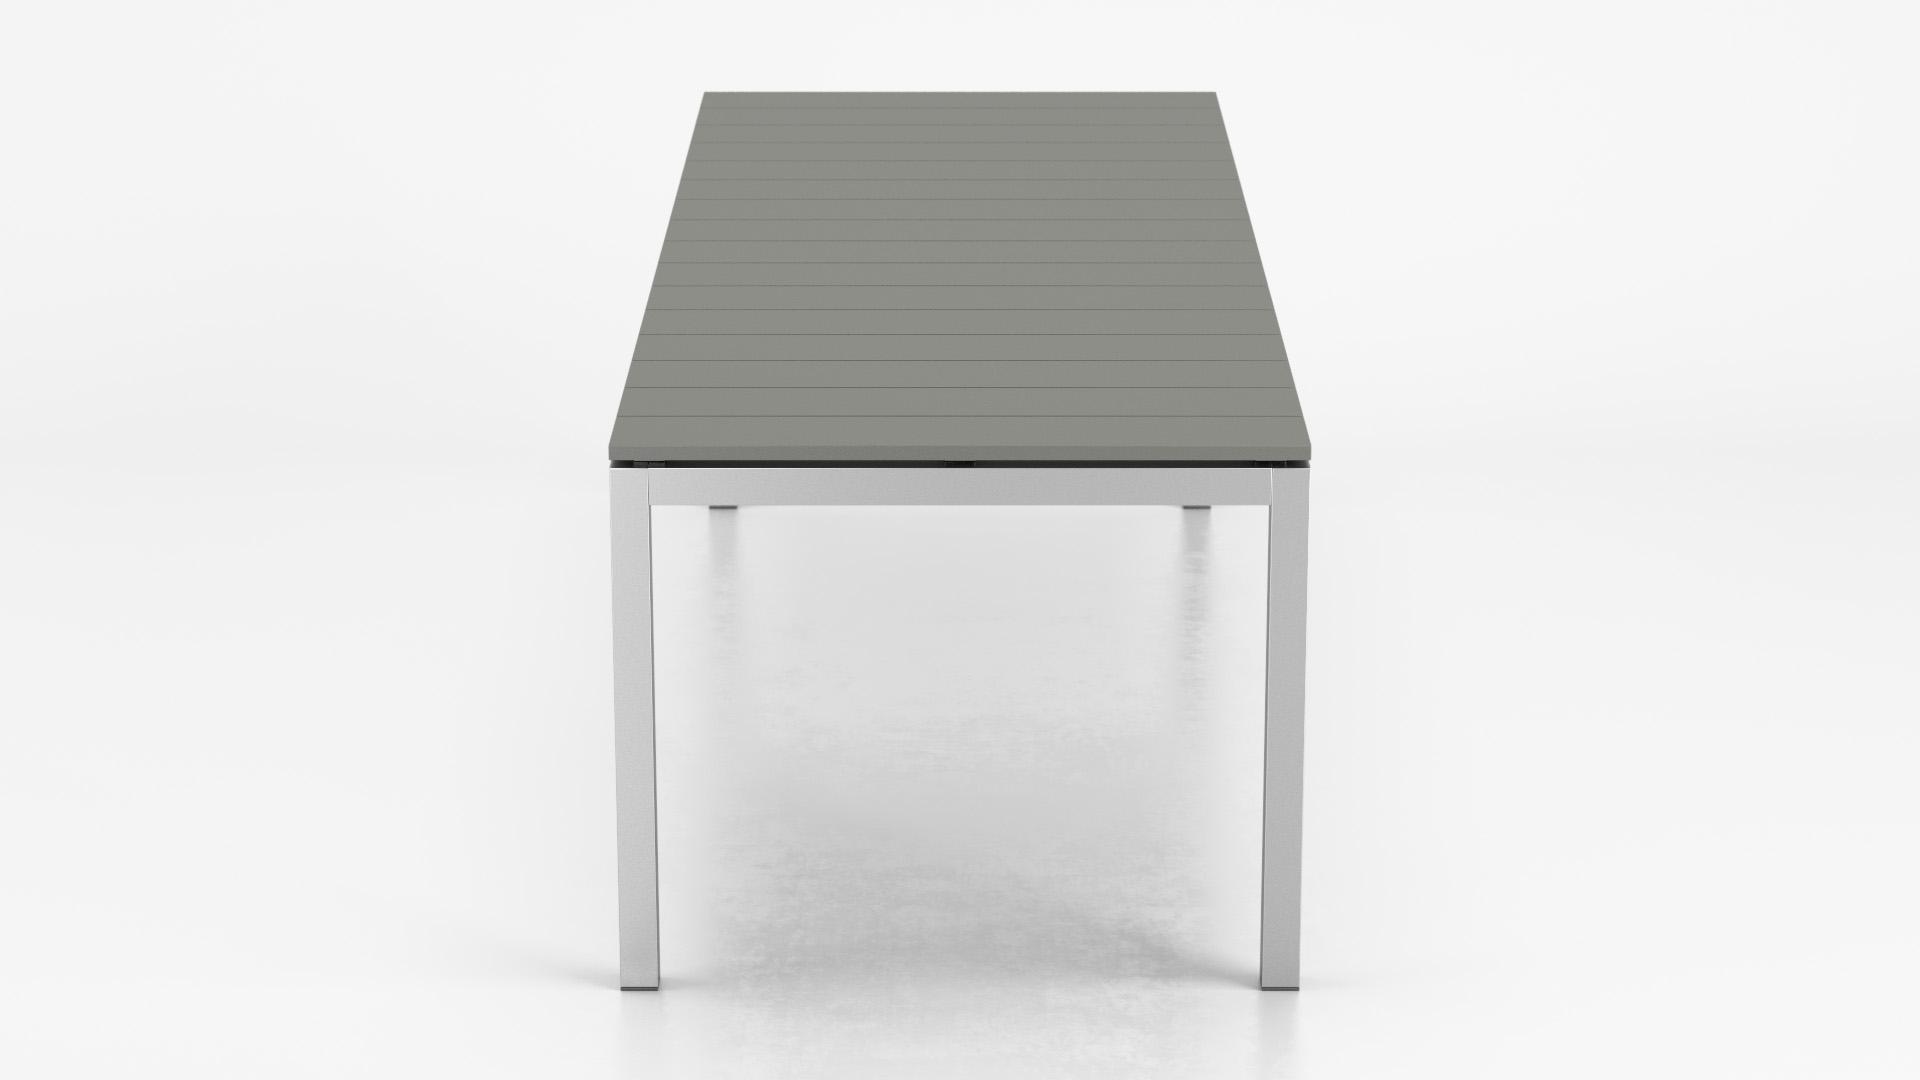 Tribu_NatalTechno_Table_WhiteSet_01_0005